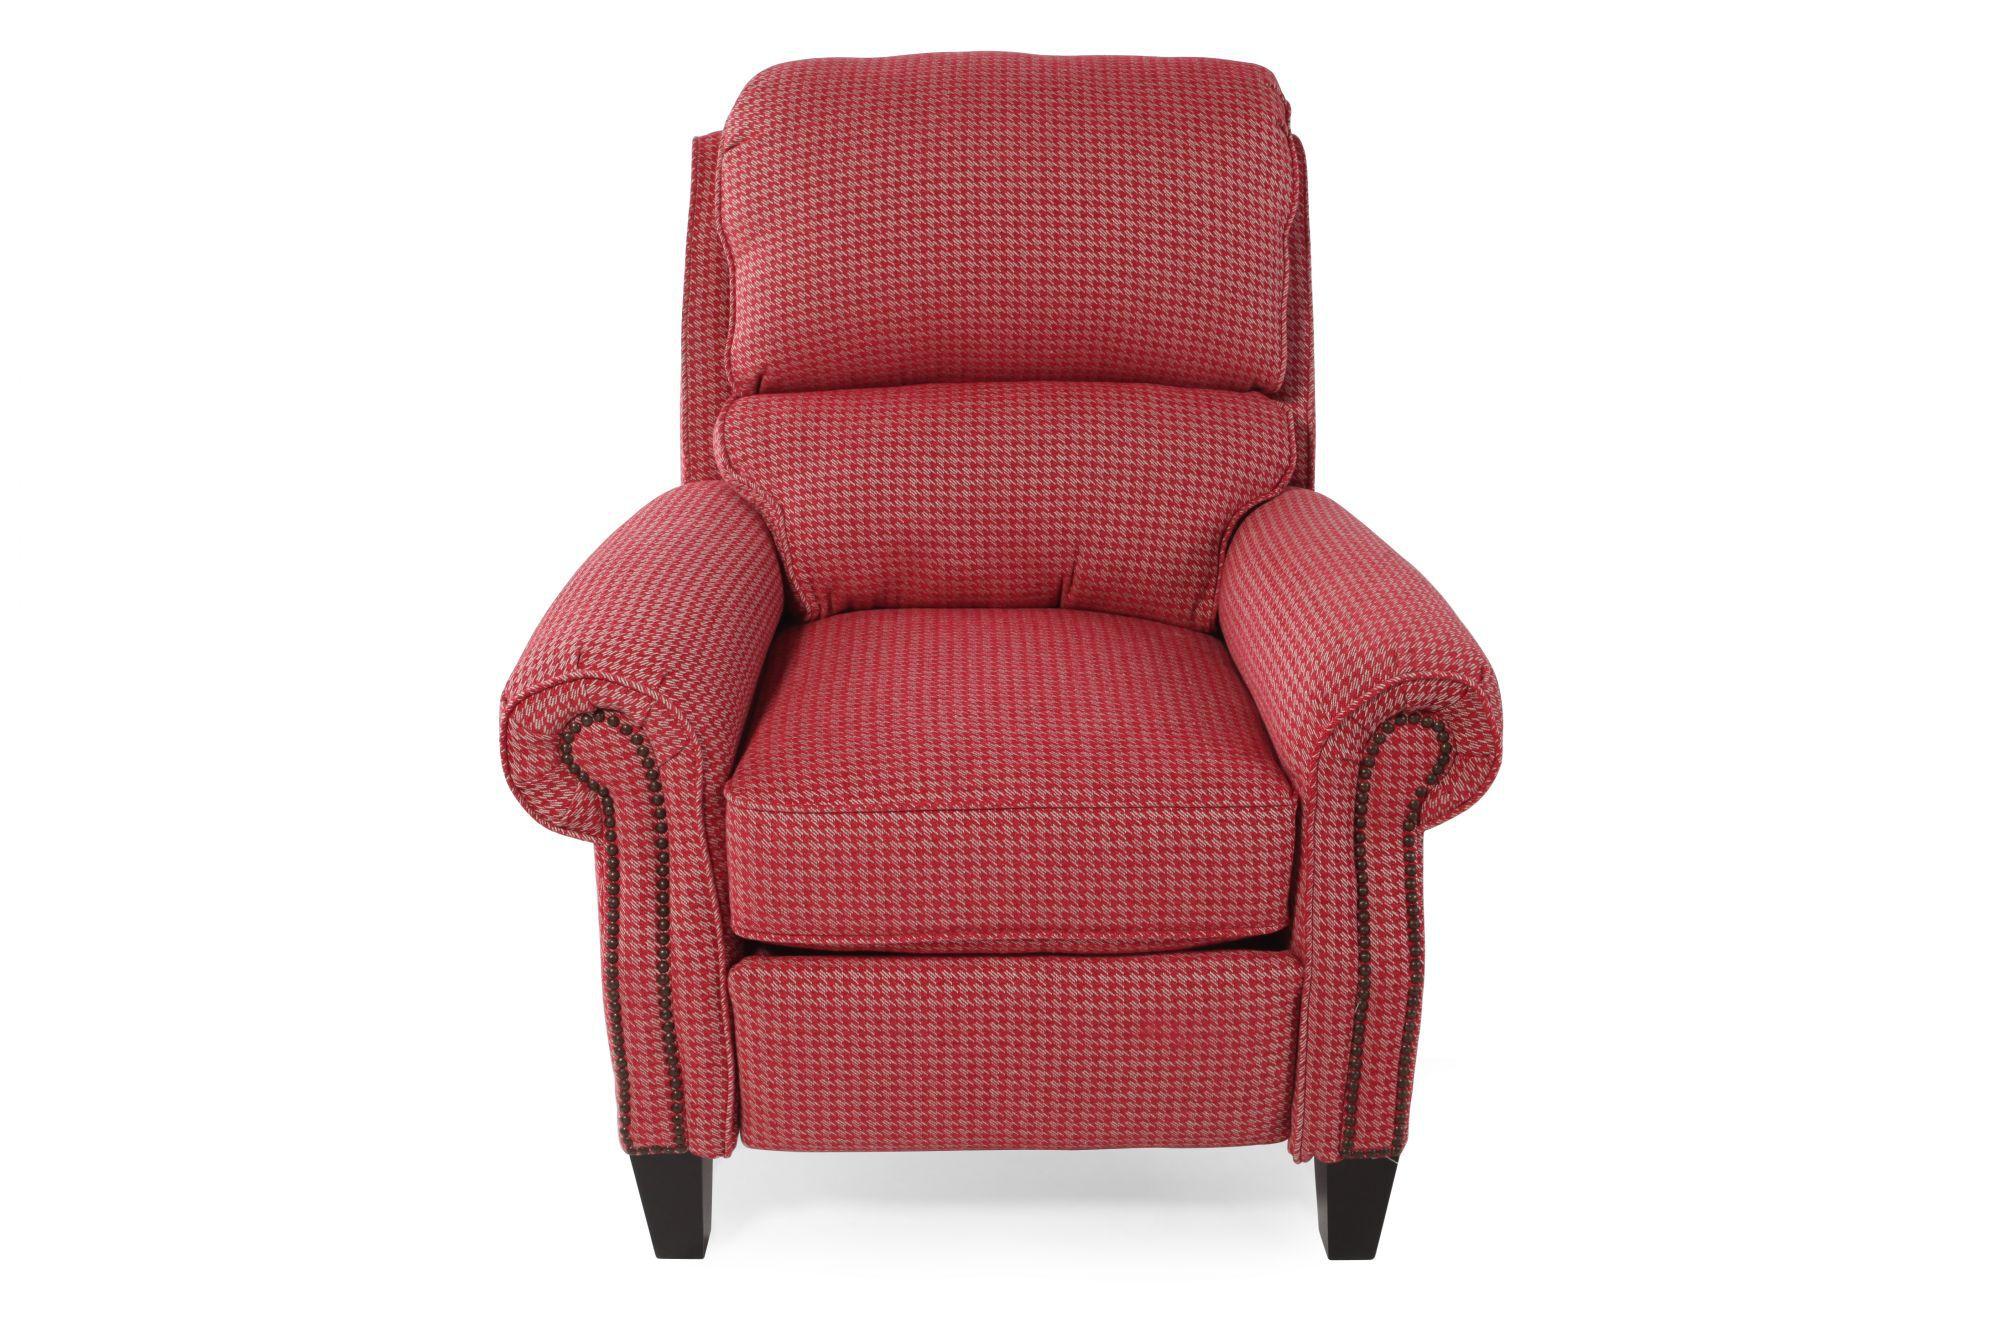 Lane Hogan Poppy Recliner ...  sc 1 st  Mathis Brothers & Recliners - Reclining Chairs u0026 Sofas | Mathis Brothers islam-shia.org